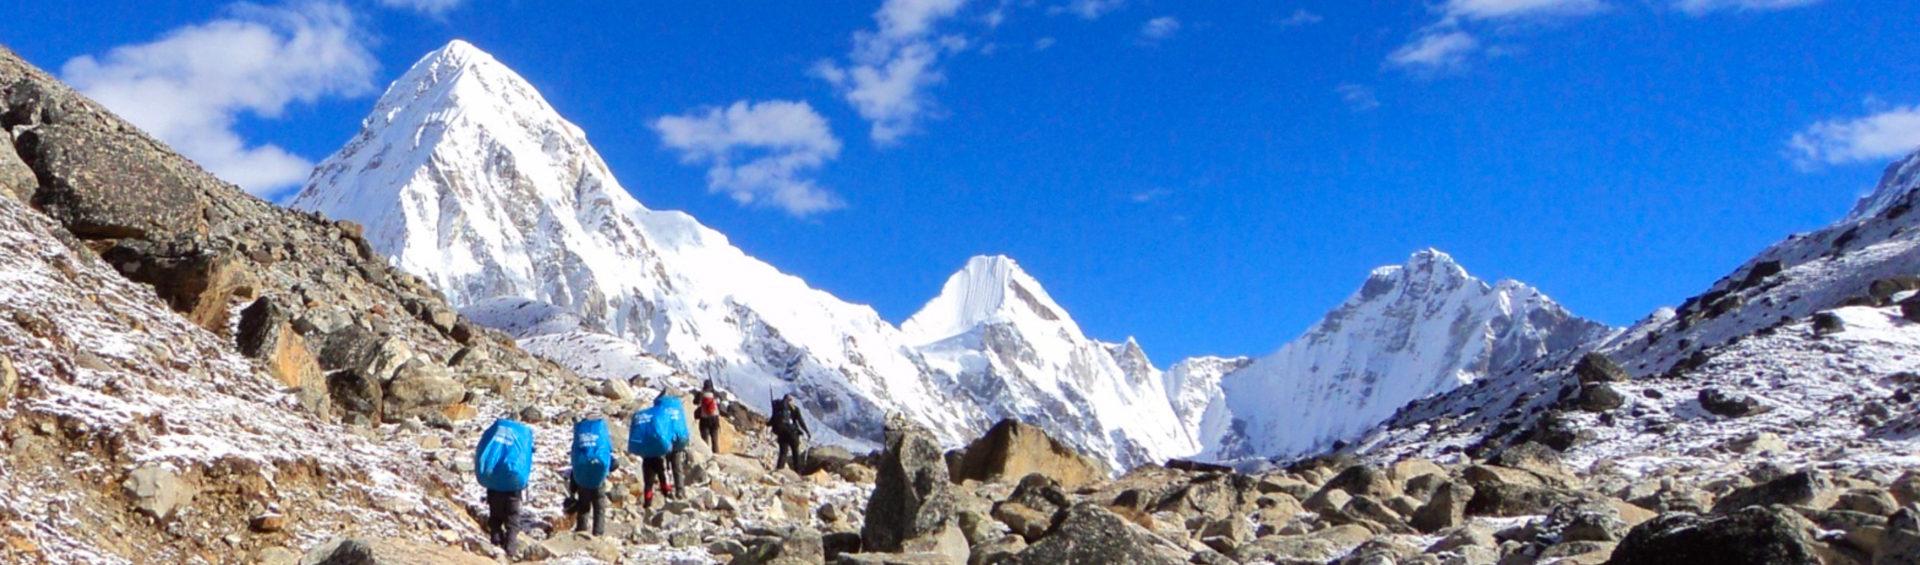 valle-gokyo-himalaya